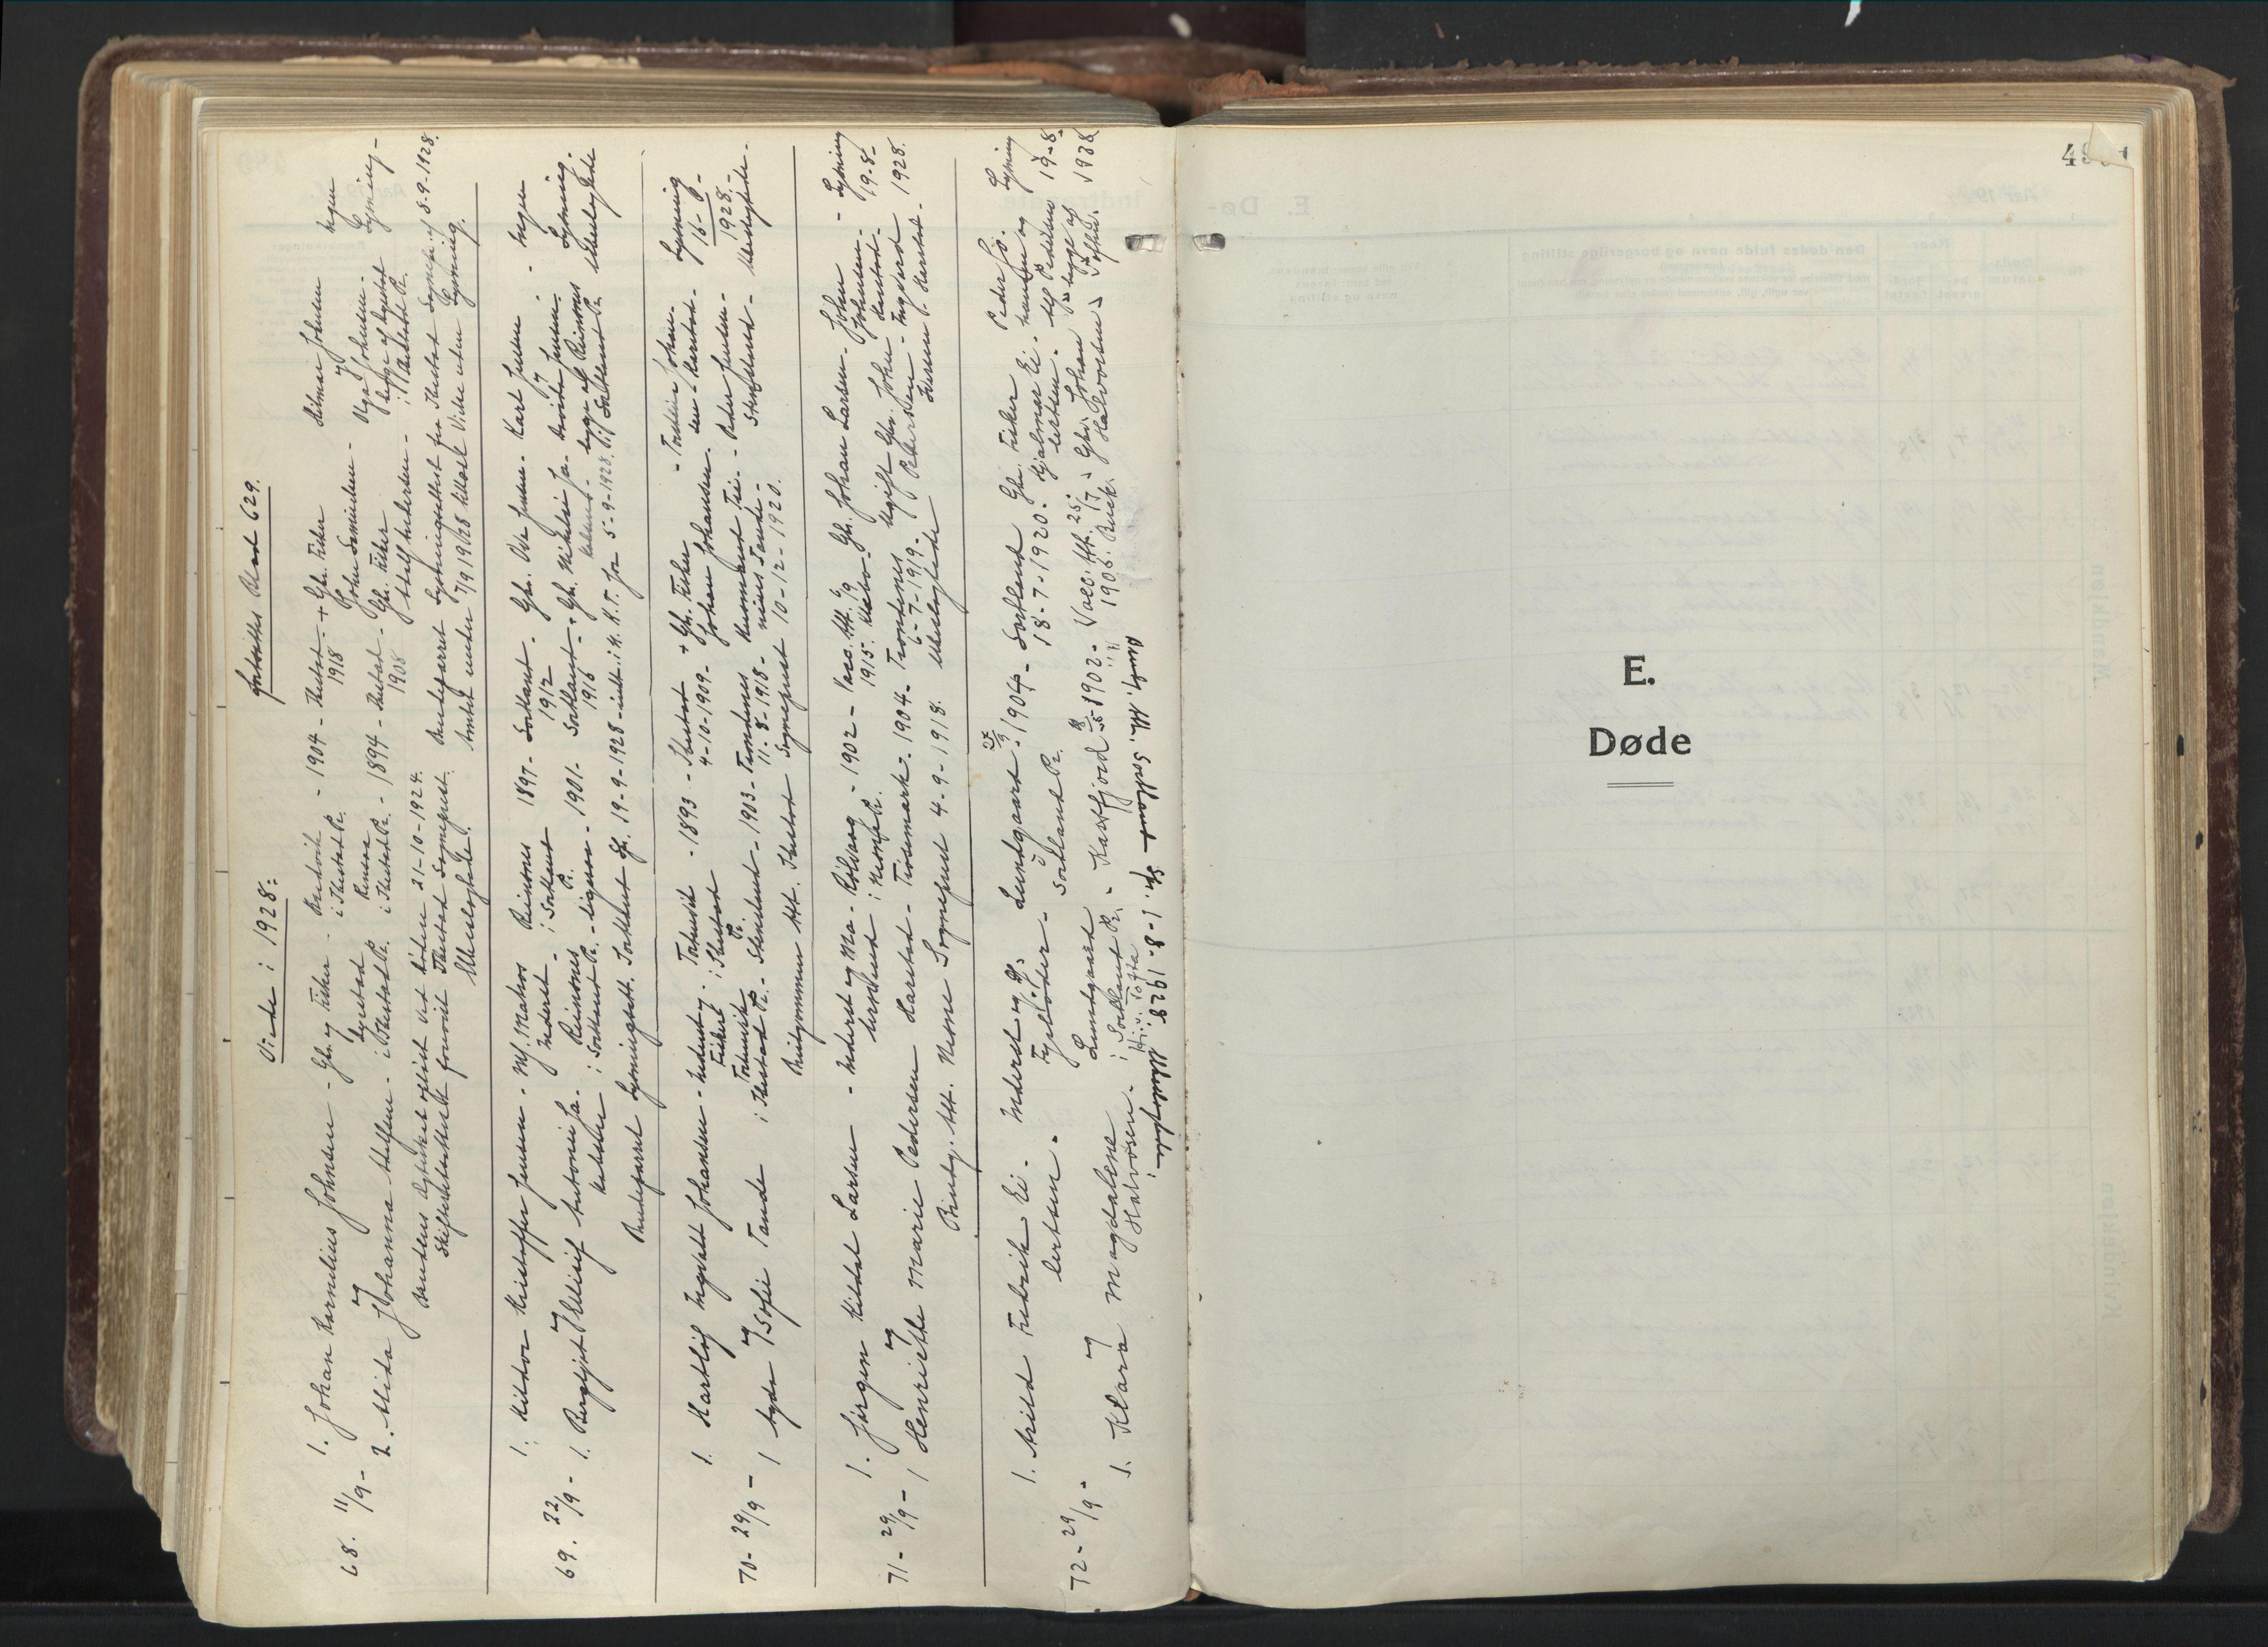 SATØ, Trondenes sokneprestkontor, H/Ha/L0019kirke: Parish register (official) no. 19, 1919-1928, p. 490